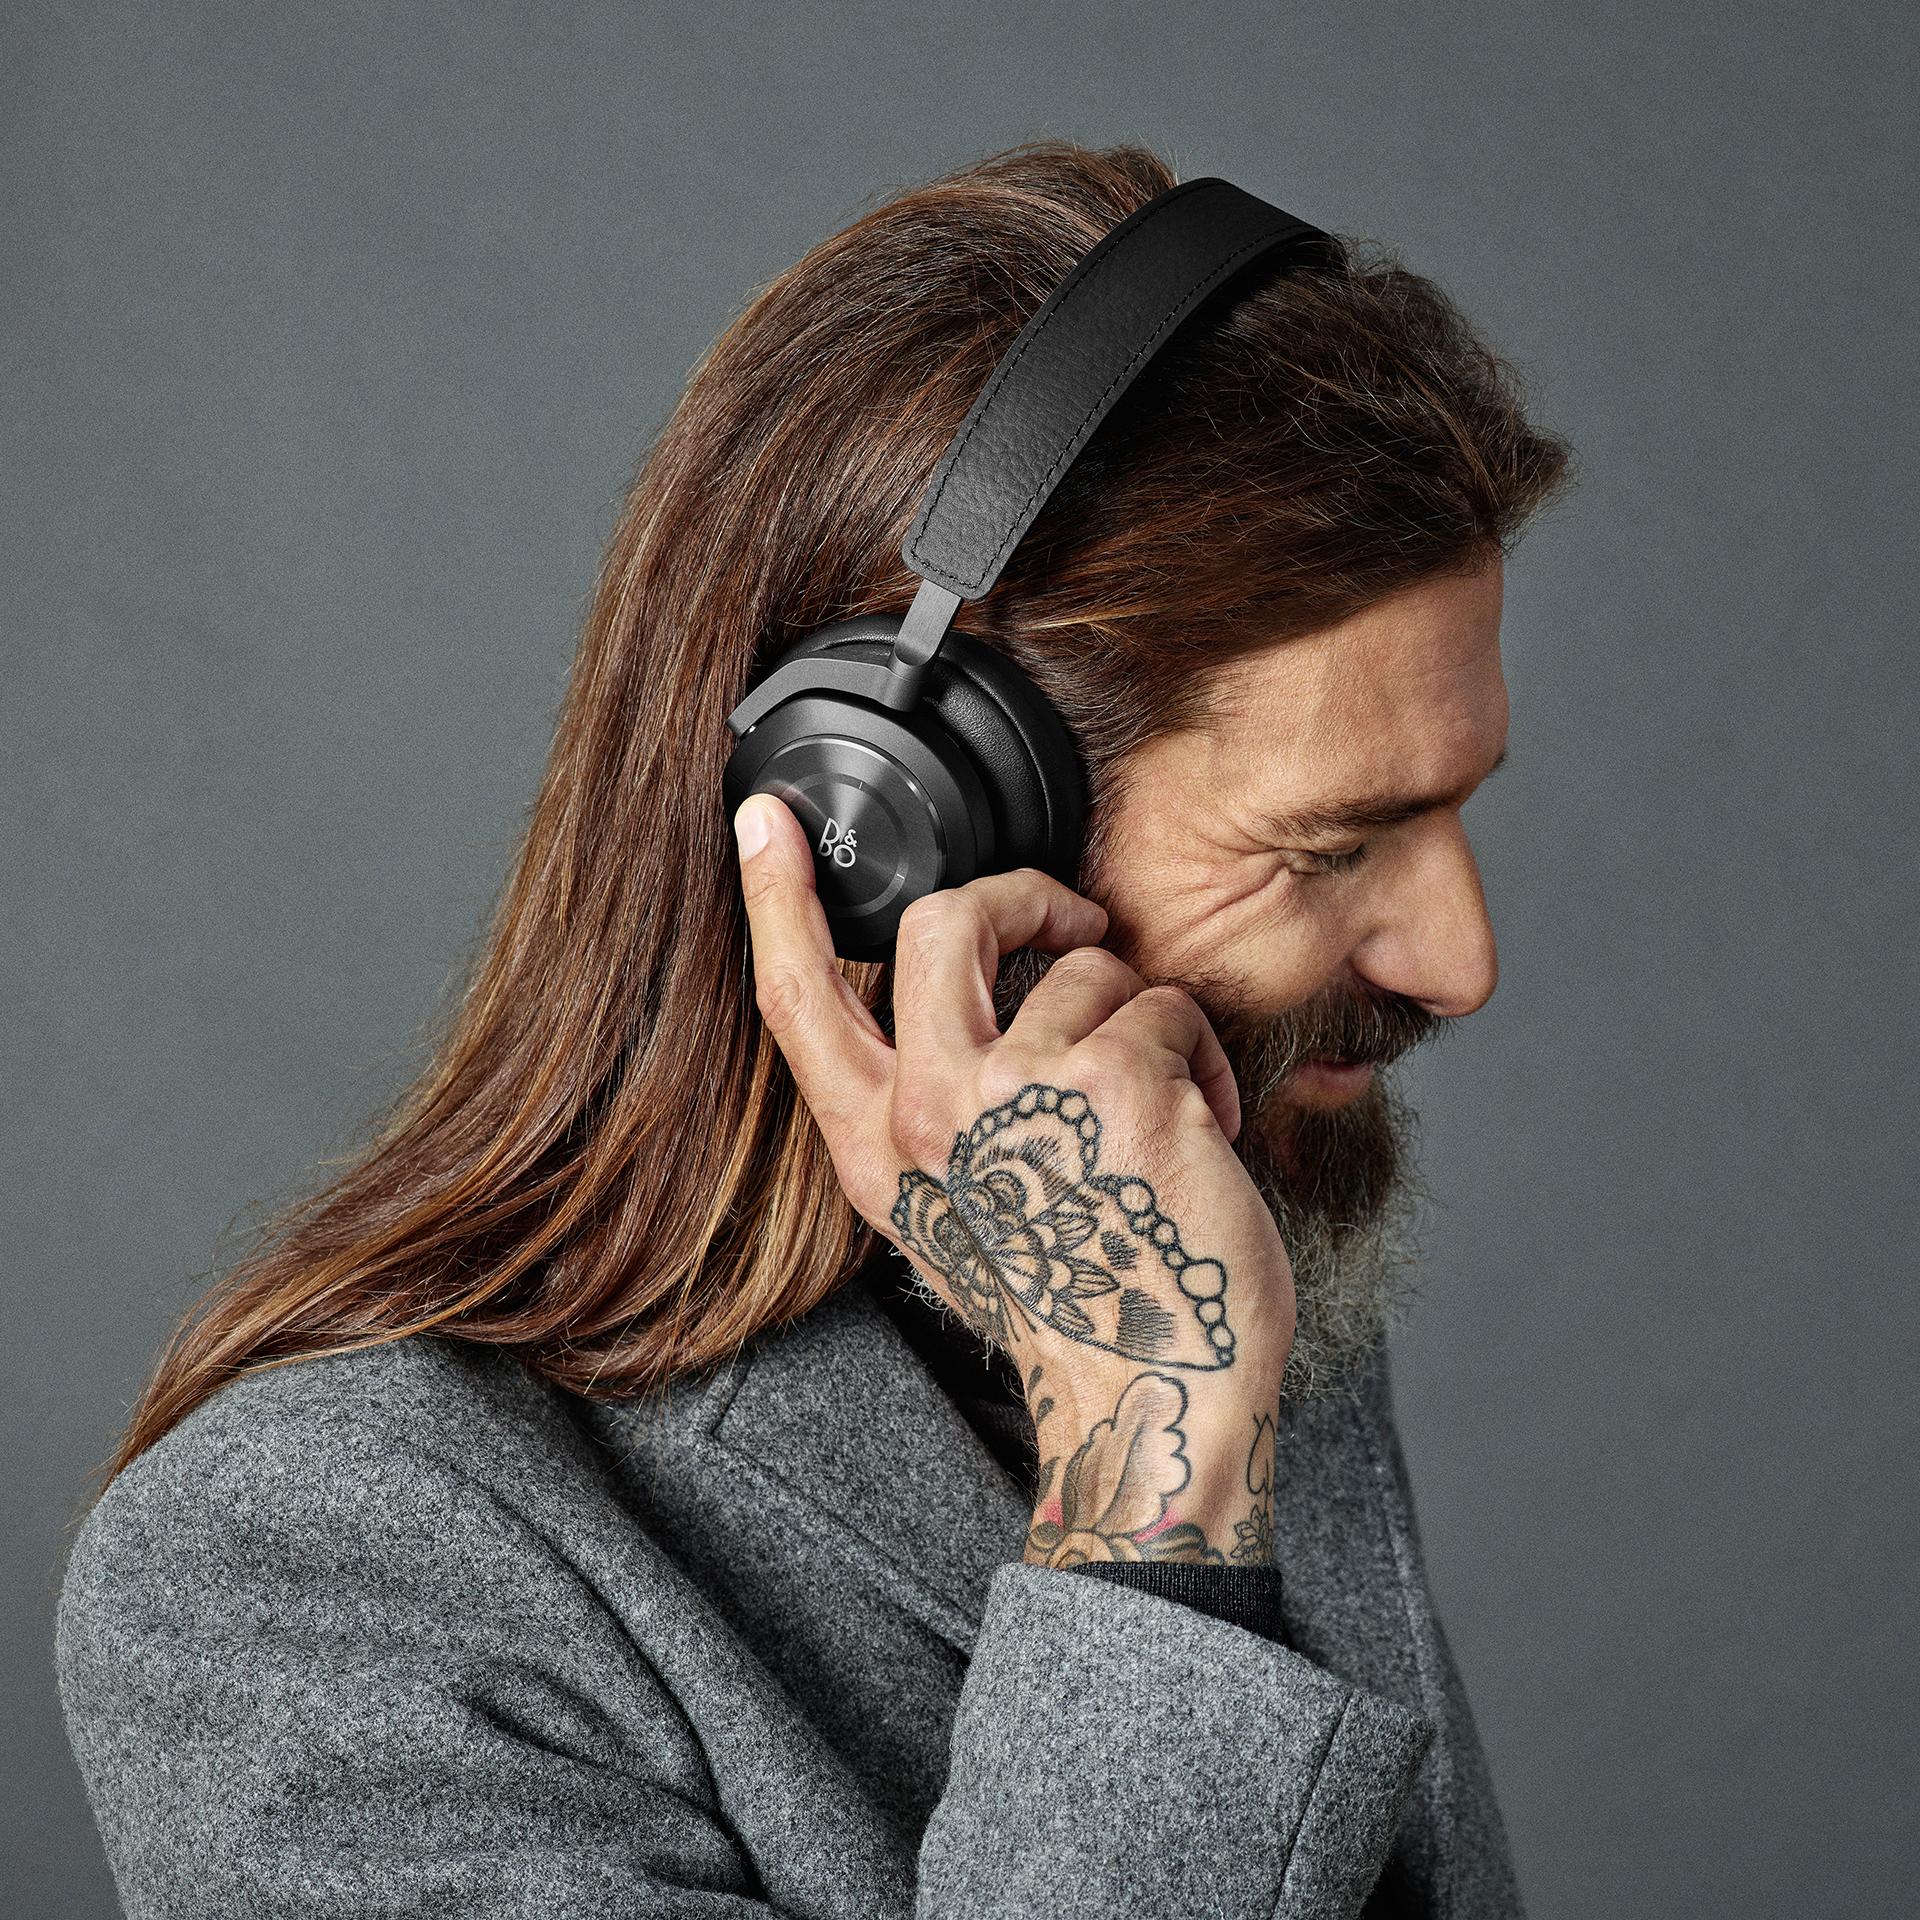 64637c26988 Beoplay H9i Pine - Over-ear Headphones | B&O